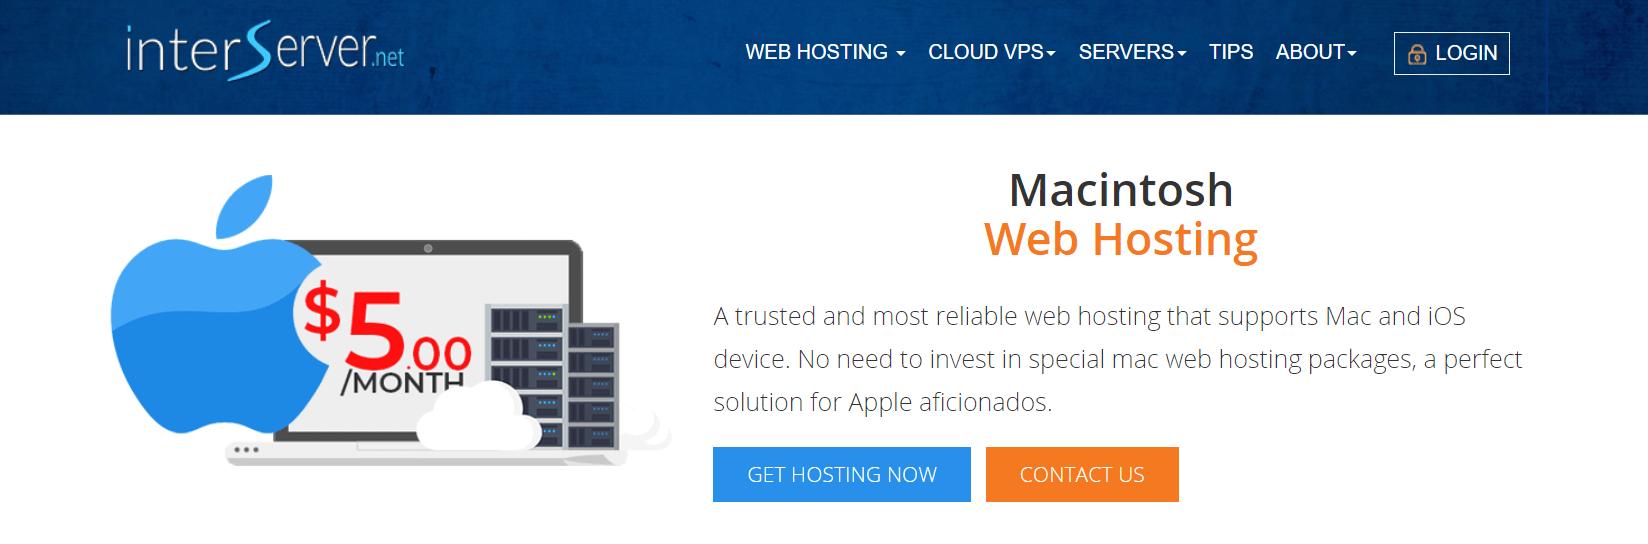 interserver mac hosting